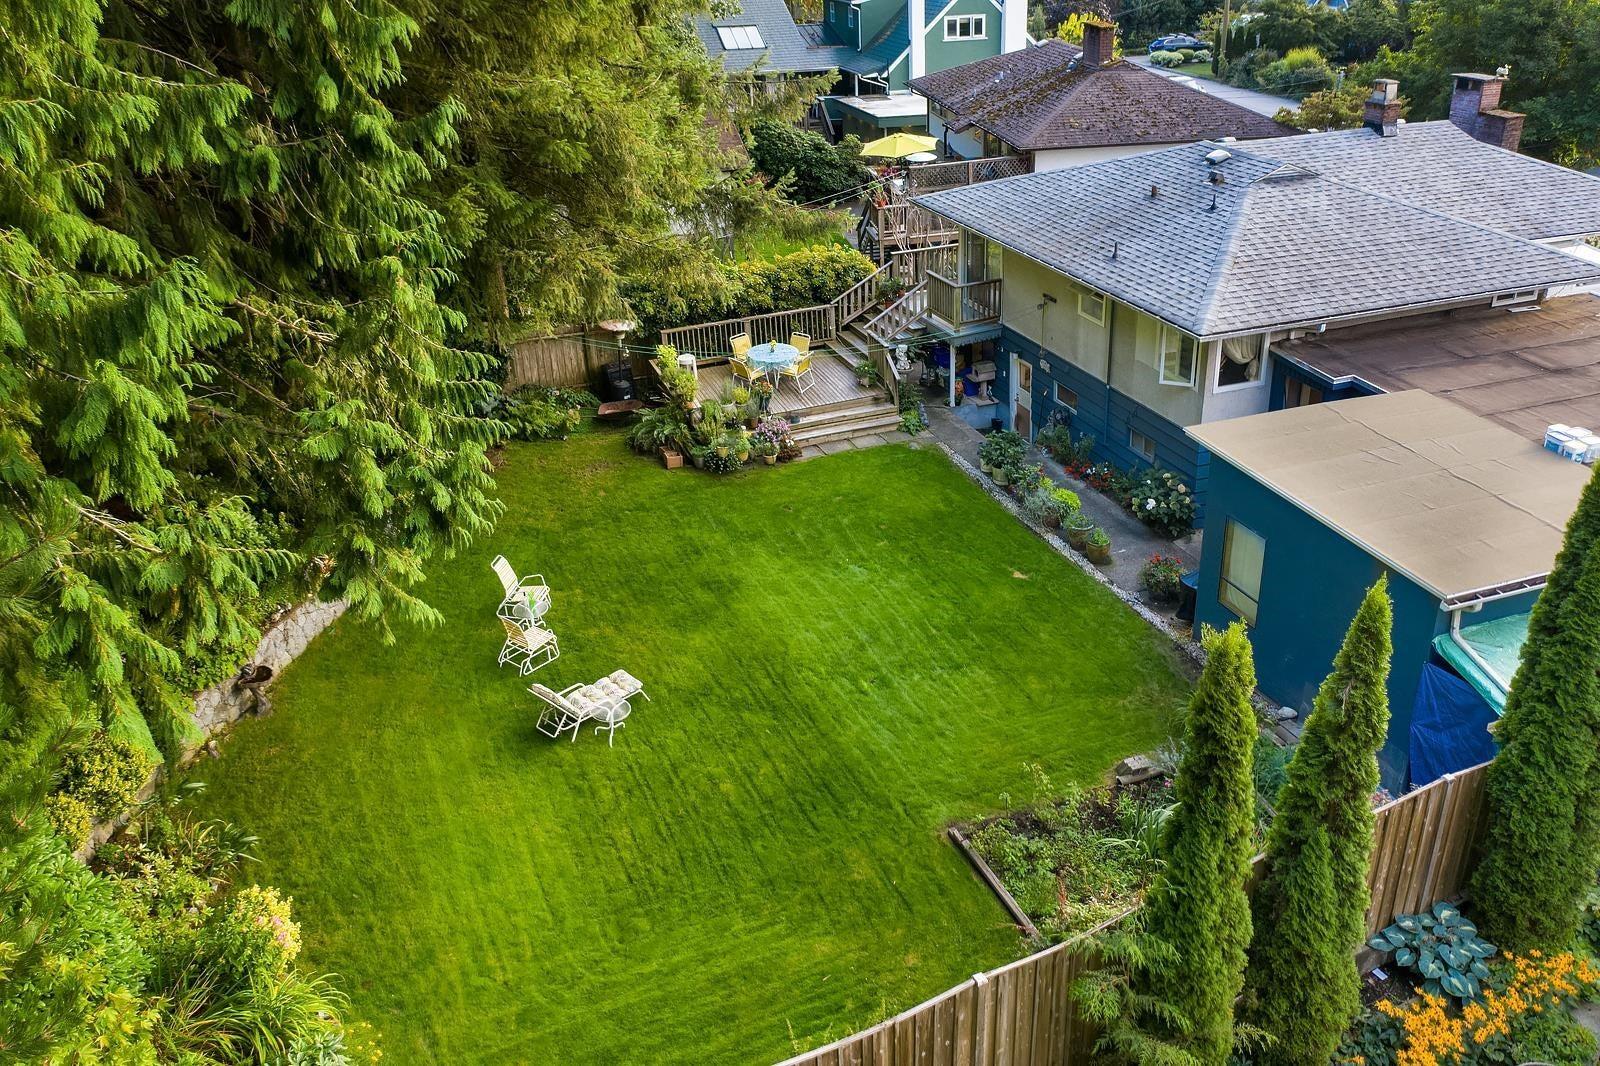 3495 WELLINGTON CRESCENT - Edgemont House/Single Family for sale, 3 Bedrooms (R2617949) - #3